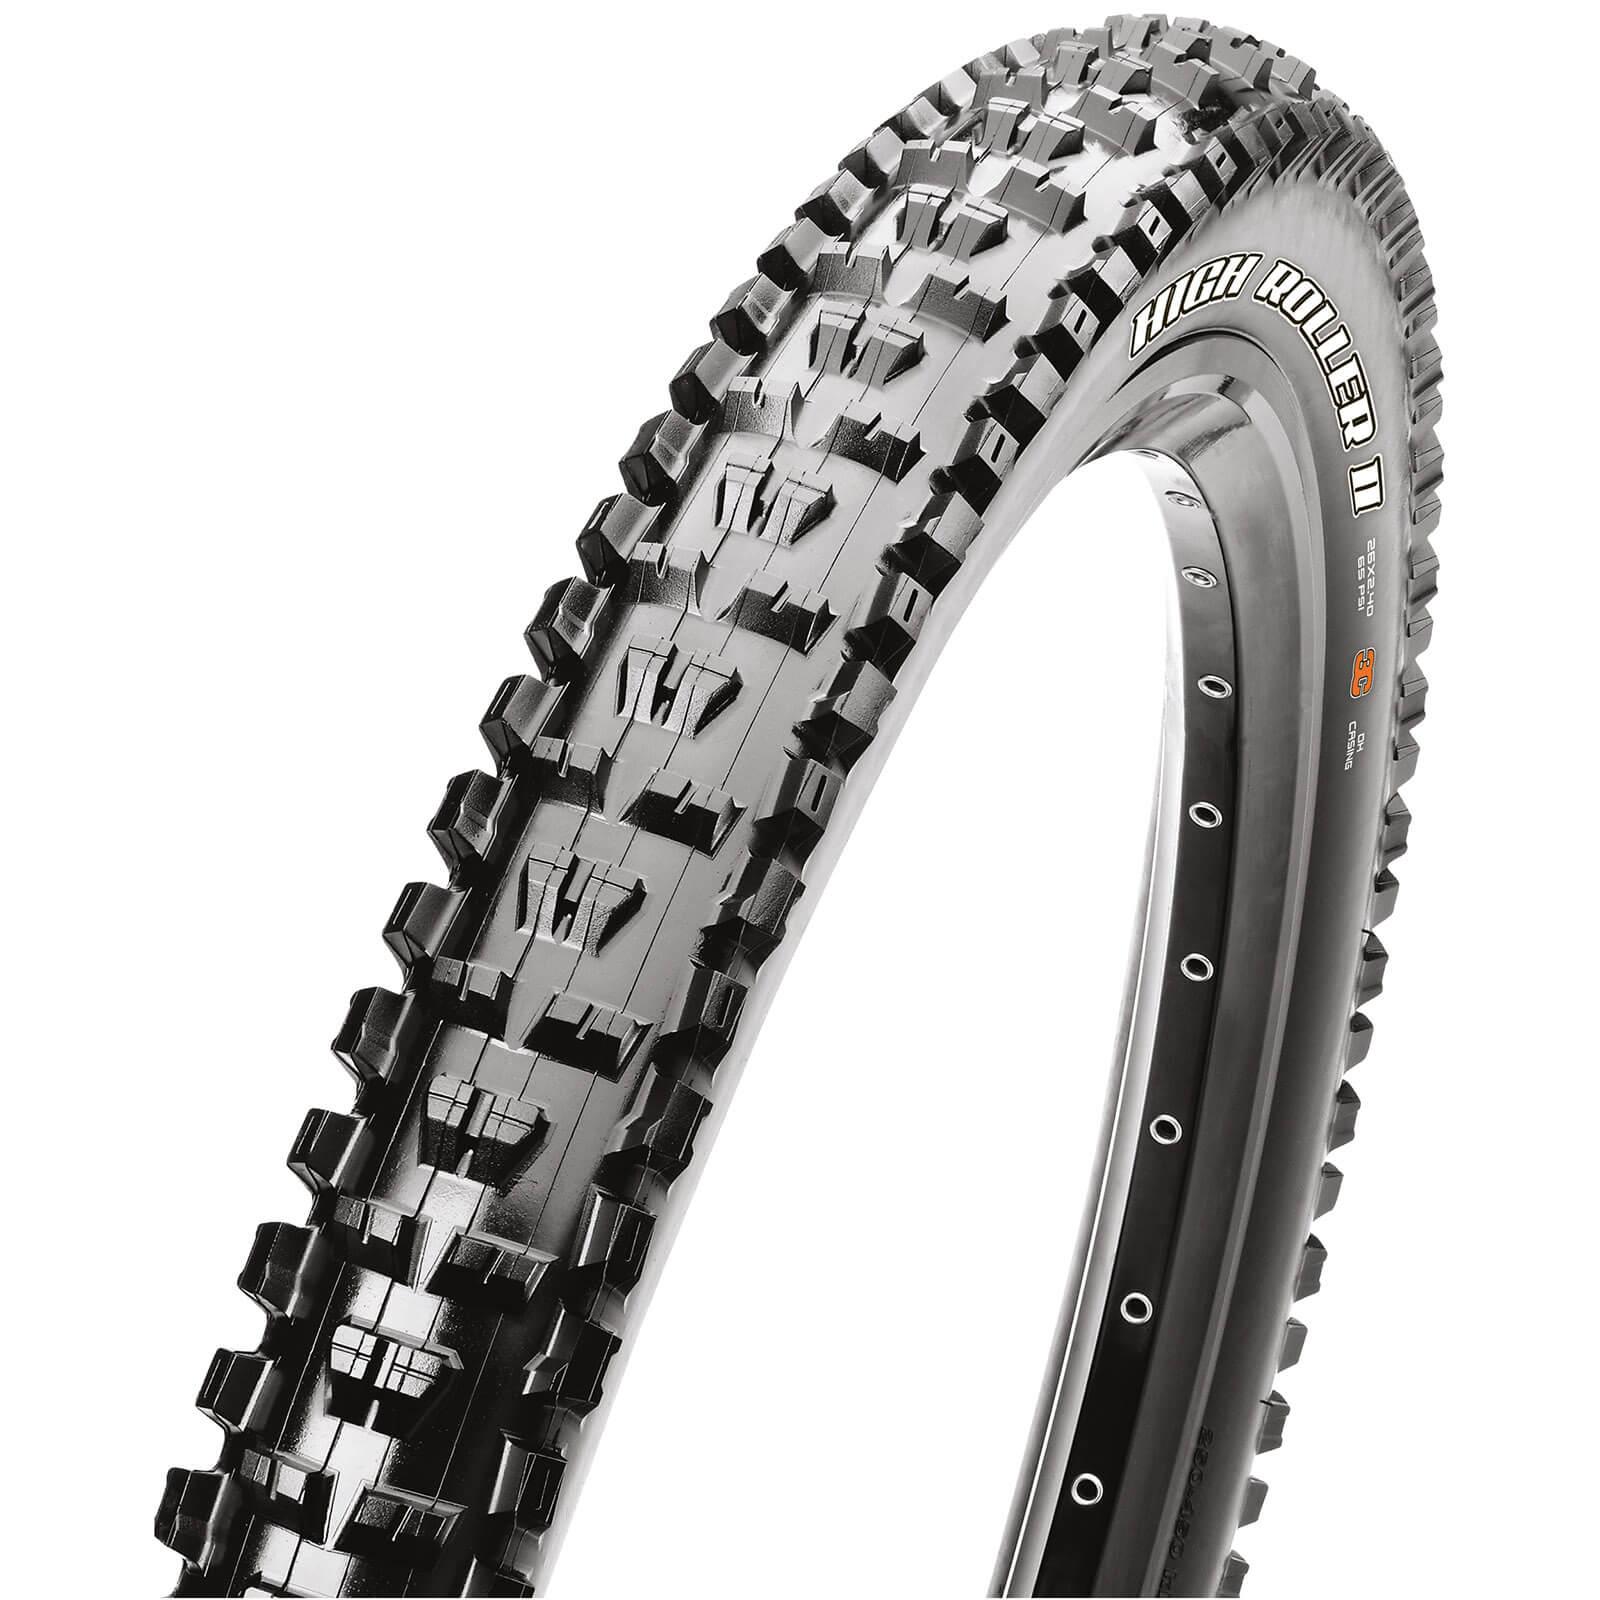 Maxxis High Roller II+ Folding 3C TR EXO Tyre - 27.5in x 3.00in